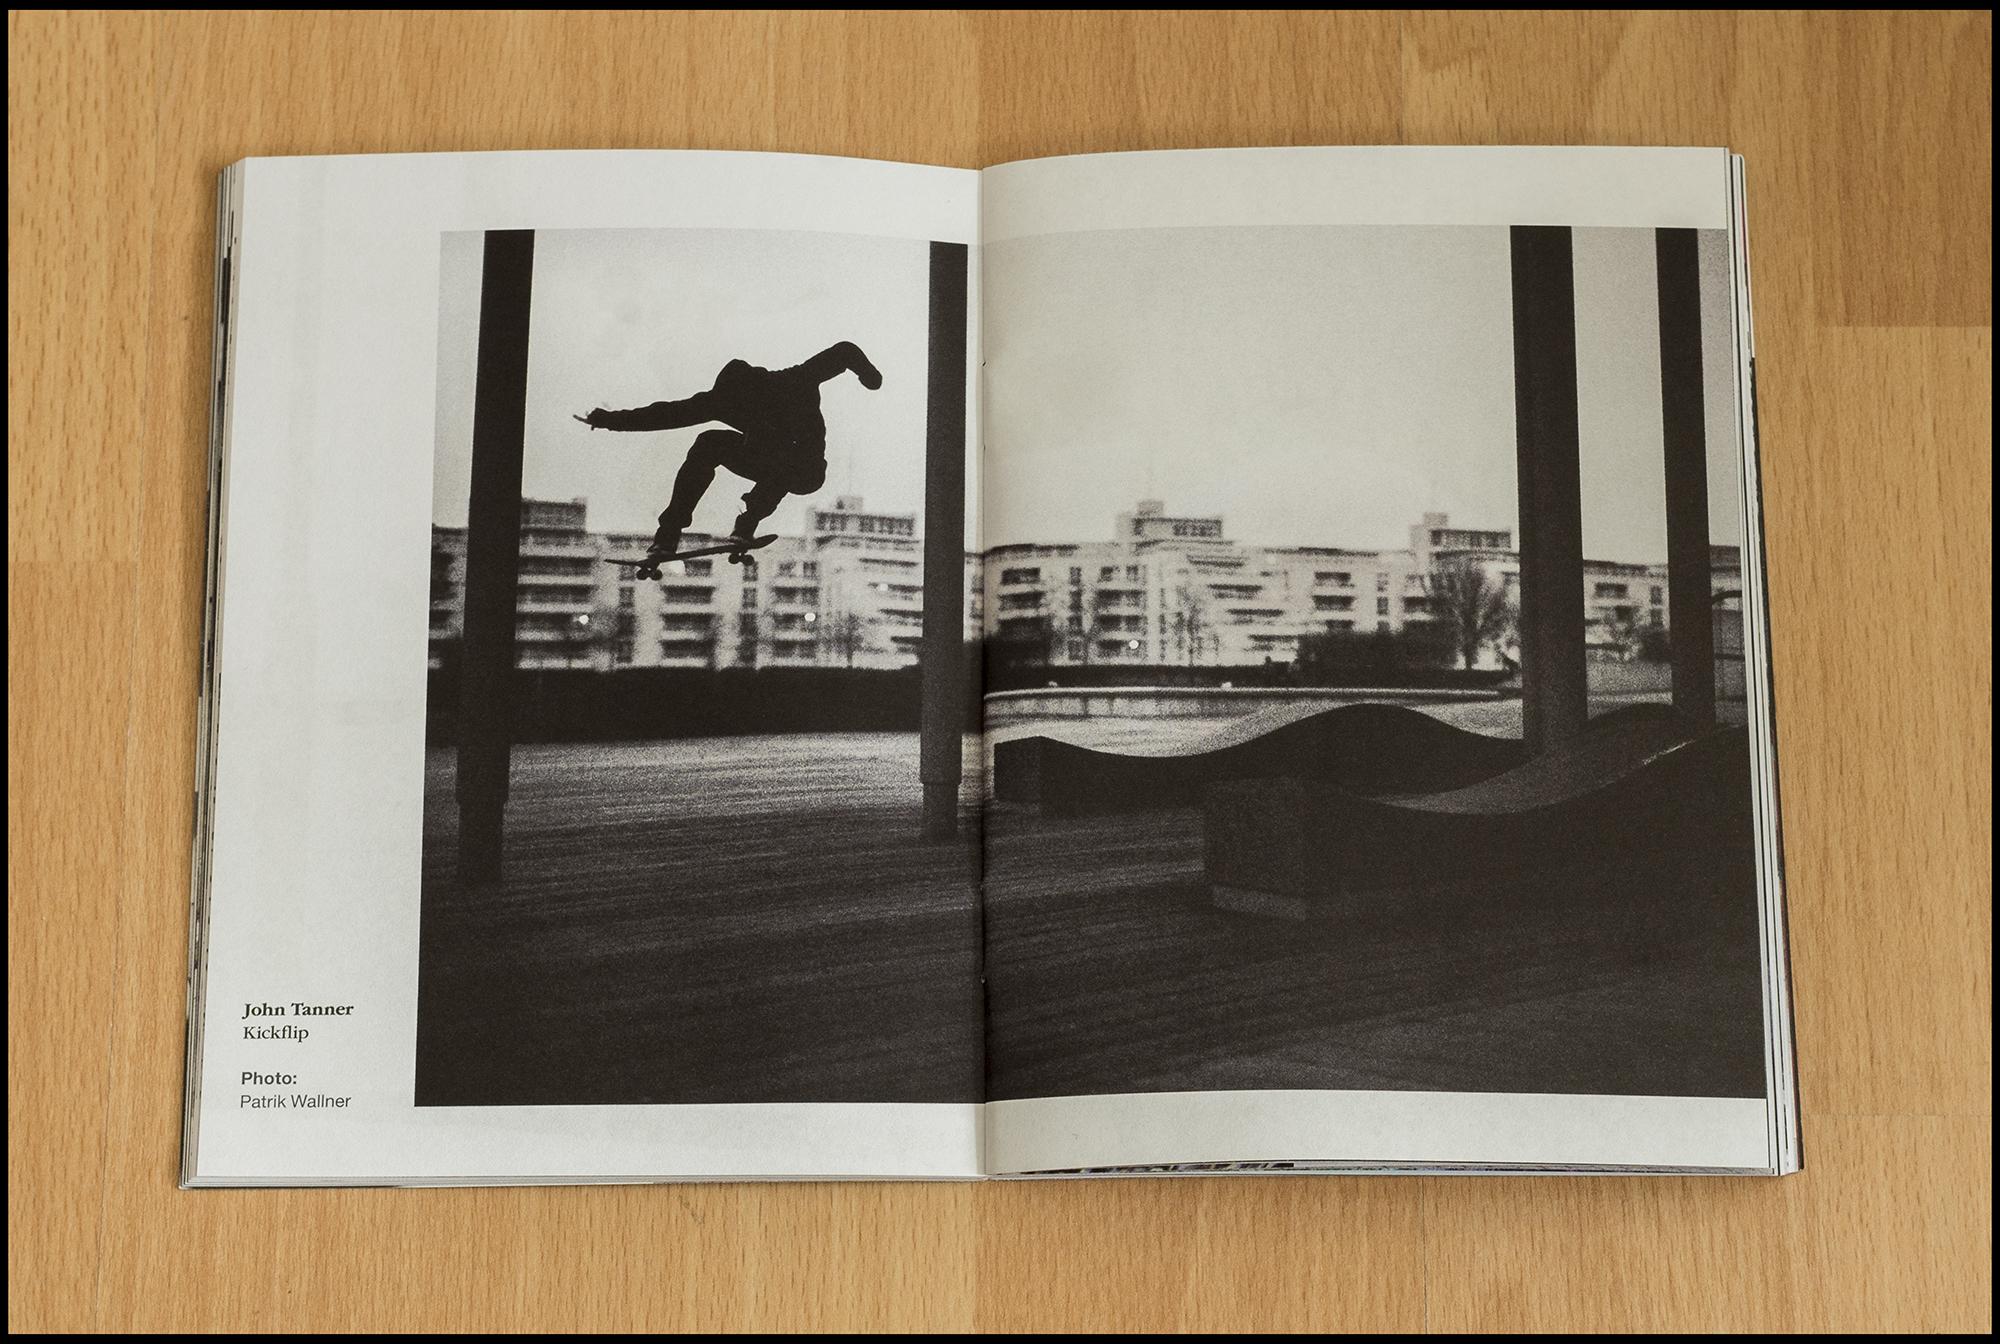 Magazines Grey Magazine Page 01 LOWQ 2000P